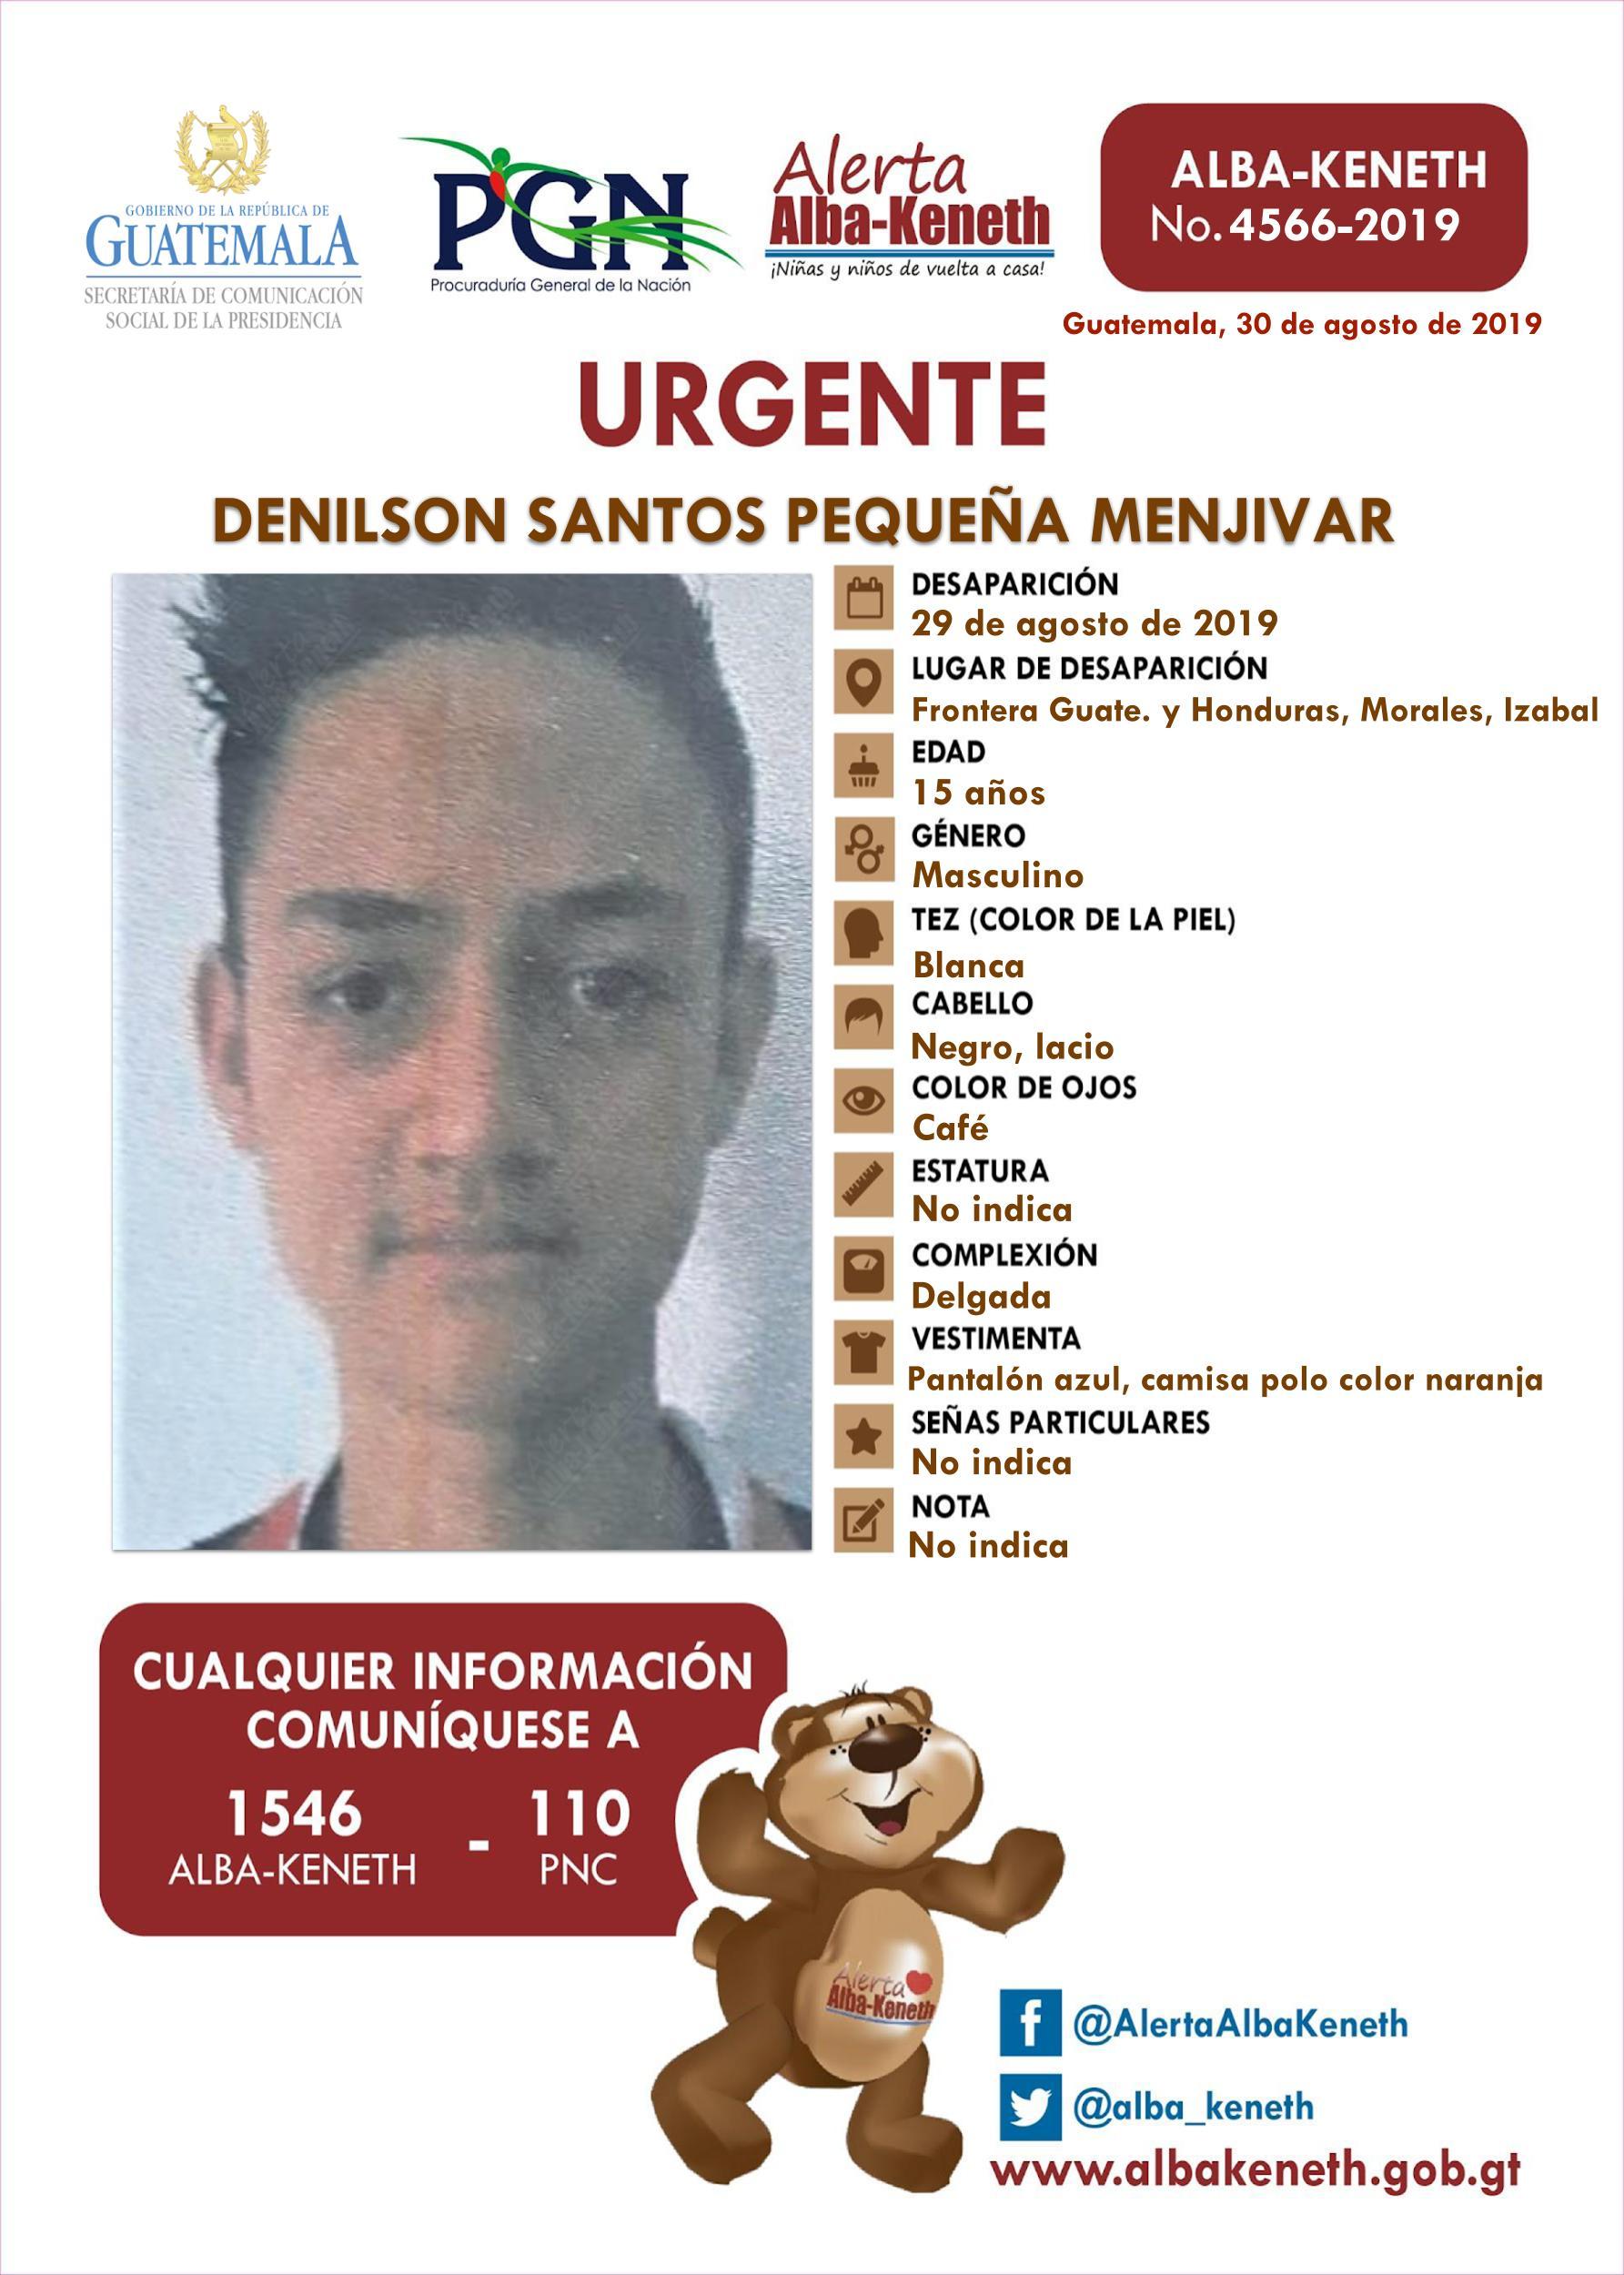 Denilson Santos Pequeña Menjivar